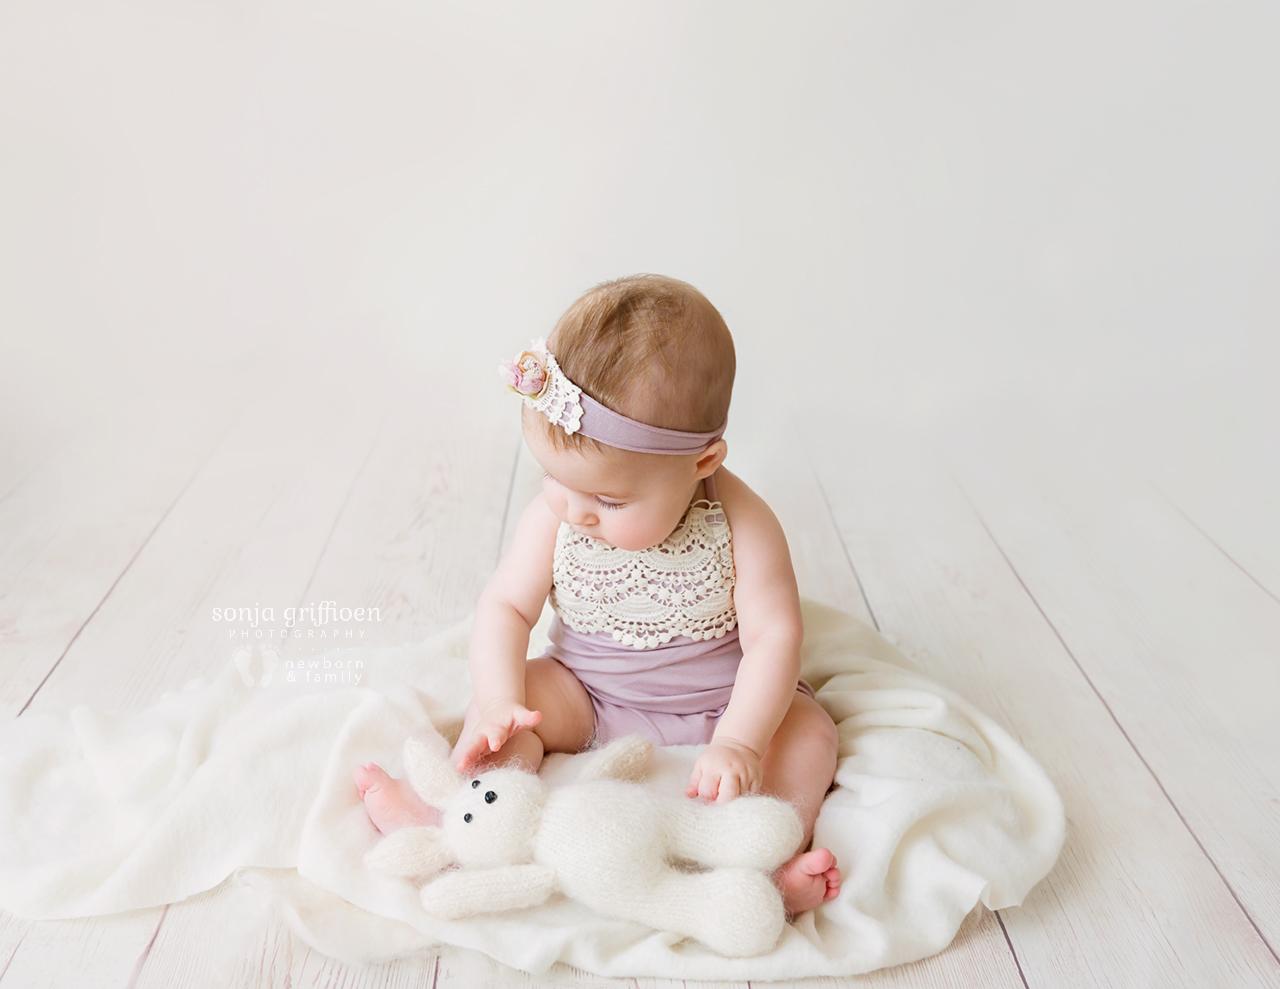 Everlyn-Milestone-Brisbane-Baby-Photography-Sonja-Griffioen-24.jpg